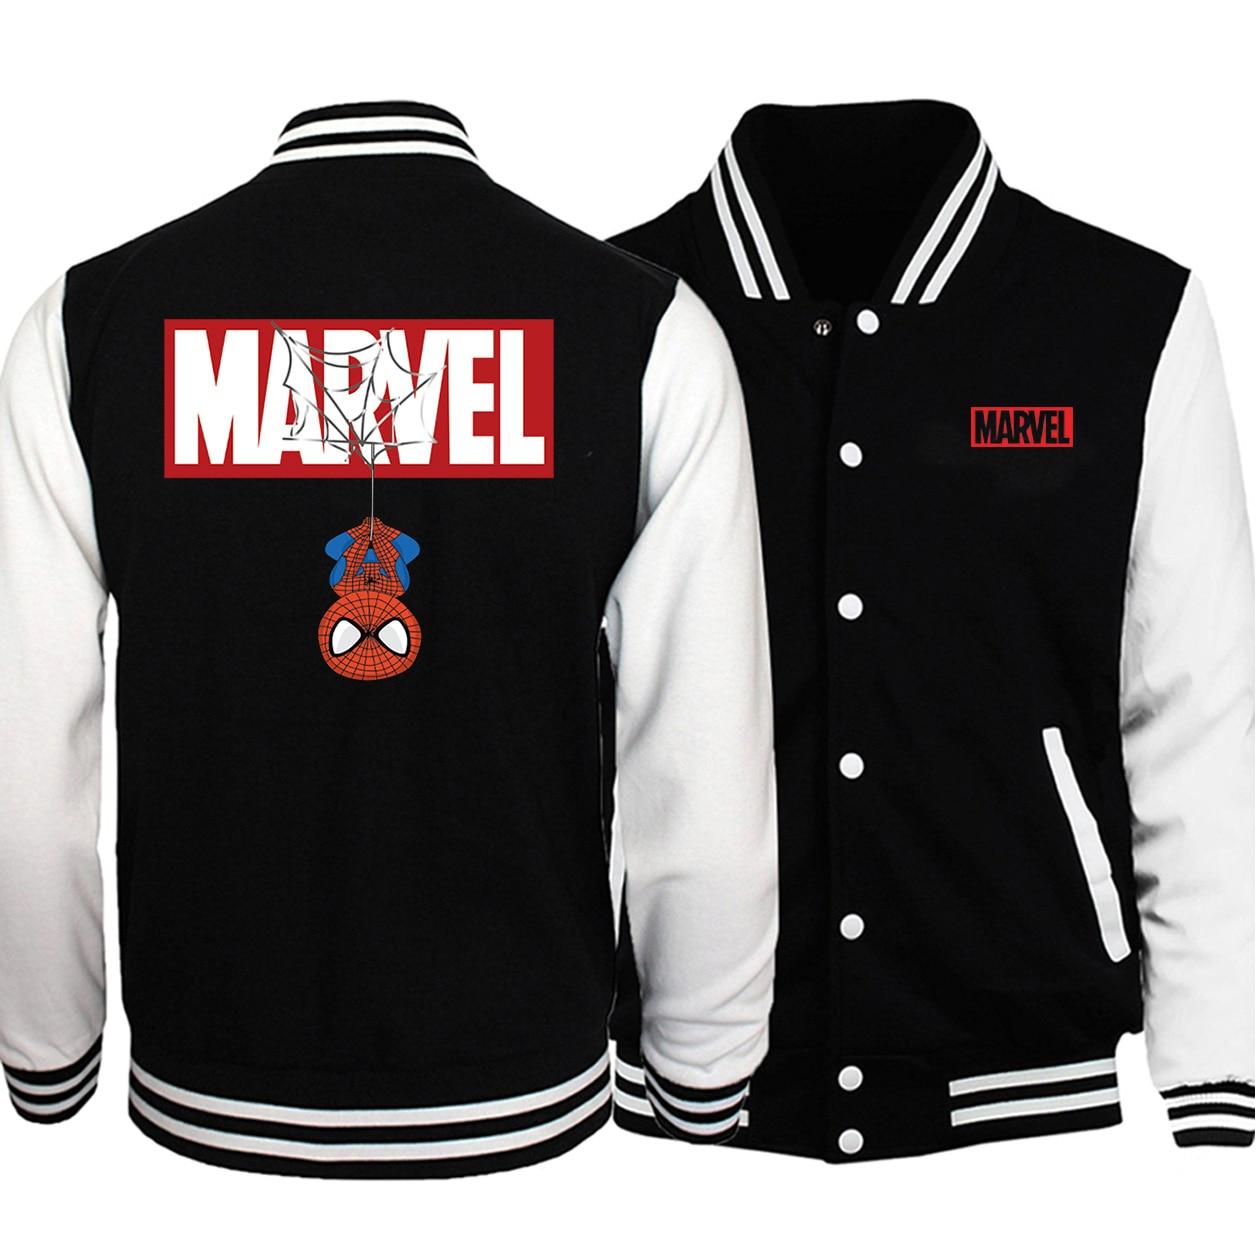 Marvel Spiderman Print Baseball Jackets Men Fashion Uniform Loose Fit Fleece Sweatshirts 2019 Autumn Winter Casual Trend Hoodies